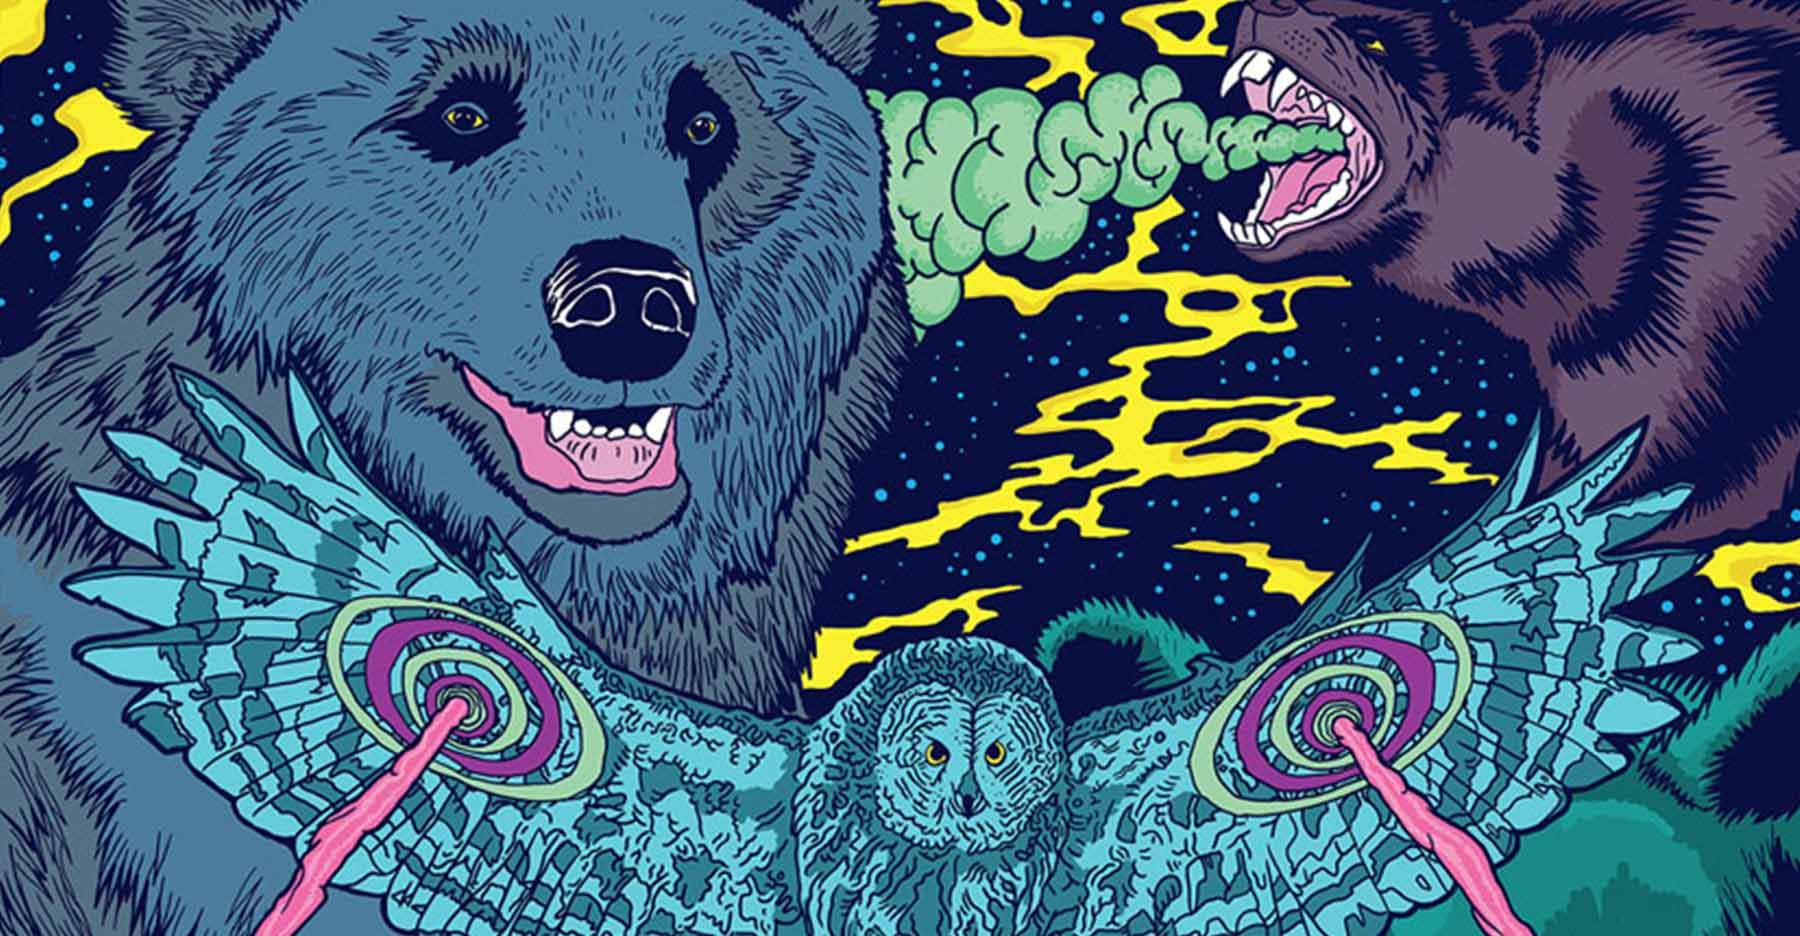 Kaffa Roastery Spirit Animal illustrations by Jari Salo